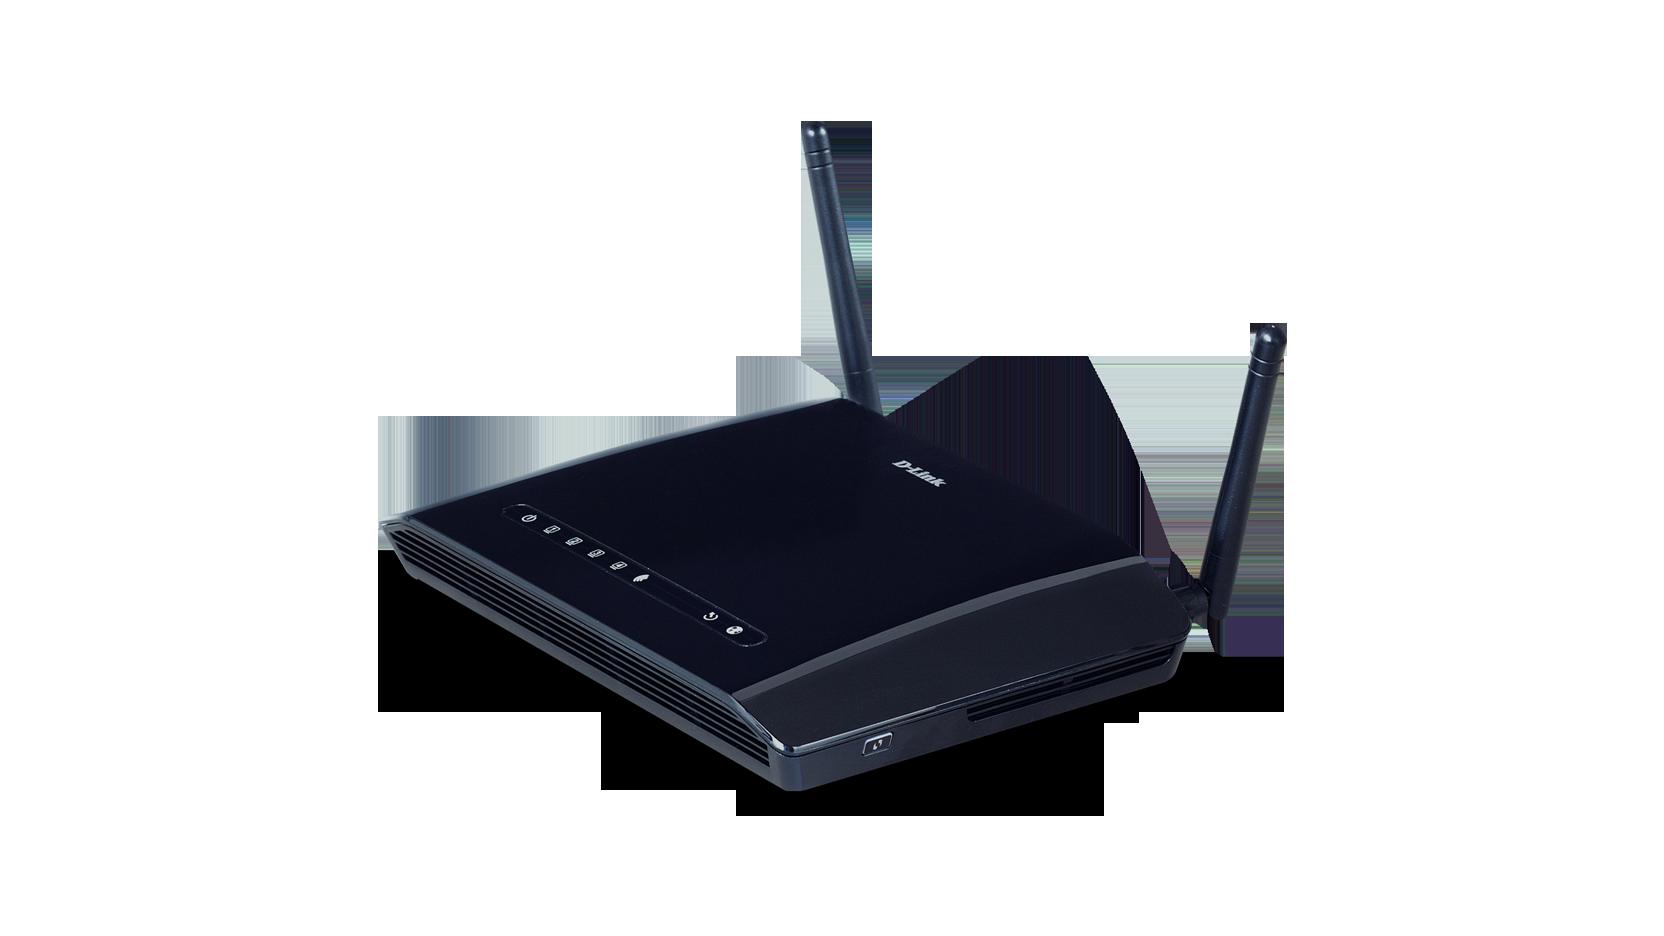 DSL-2740B Wireless N300 ADSL2+ Modem Router   D-Link Sweden